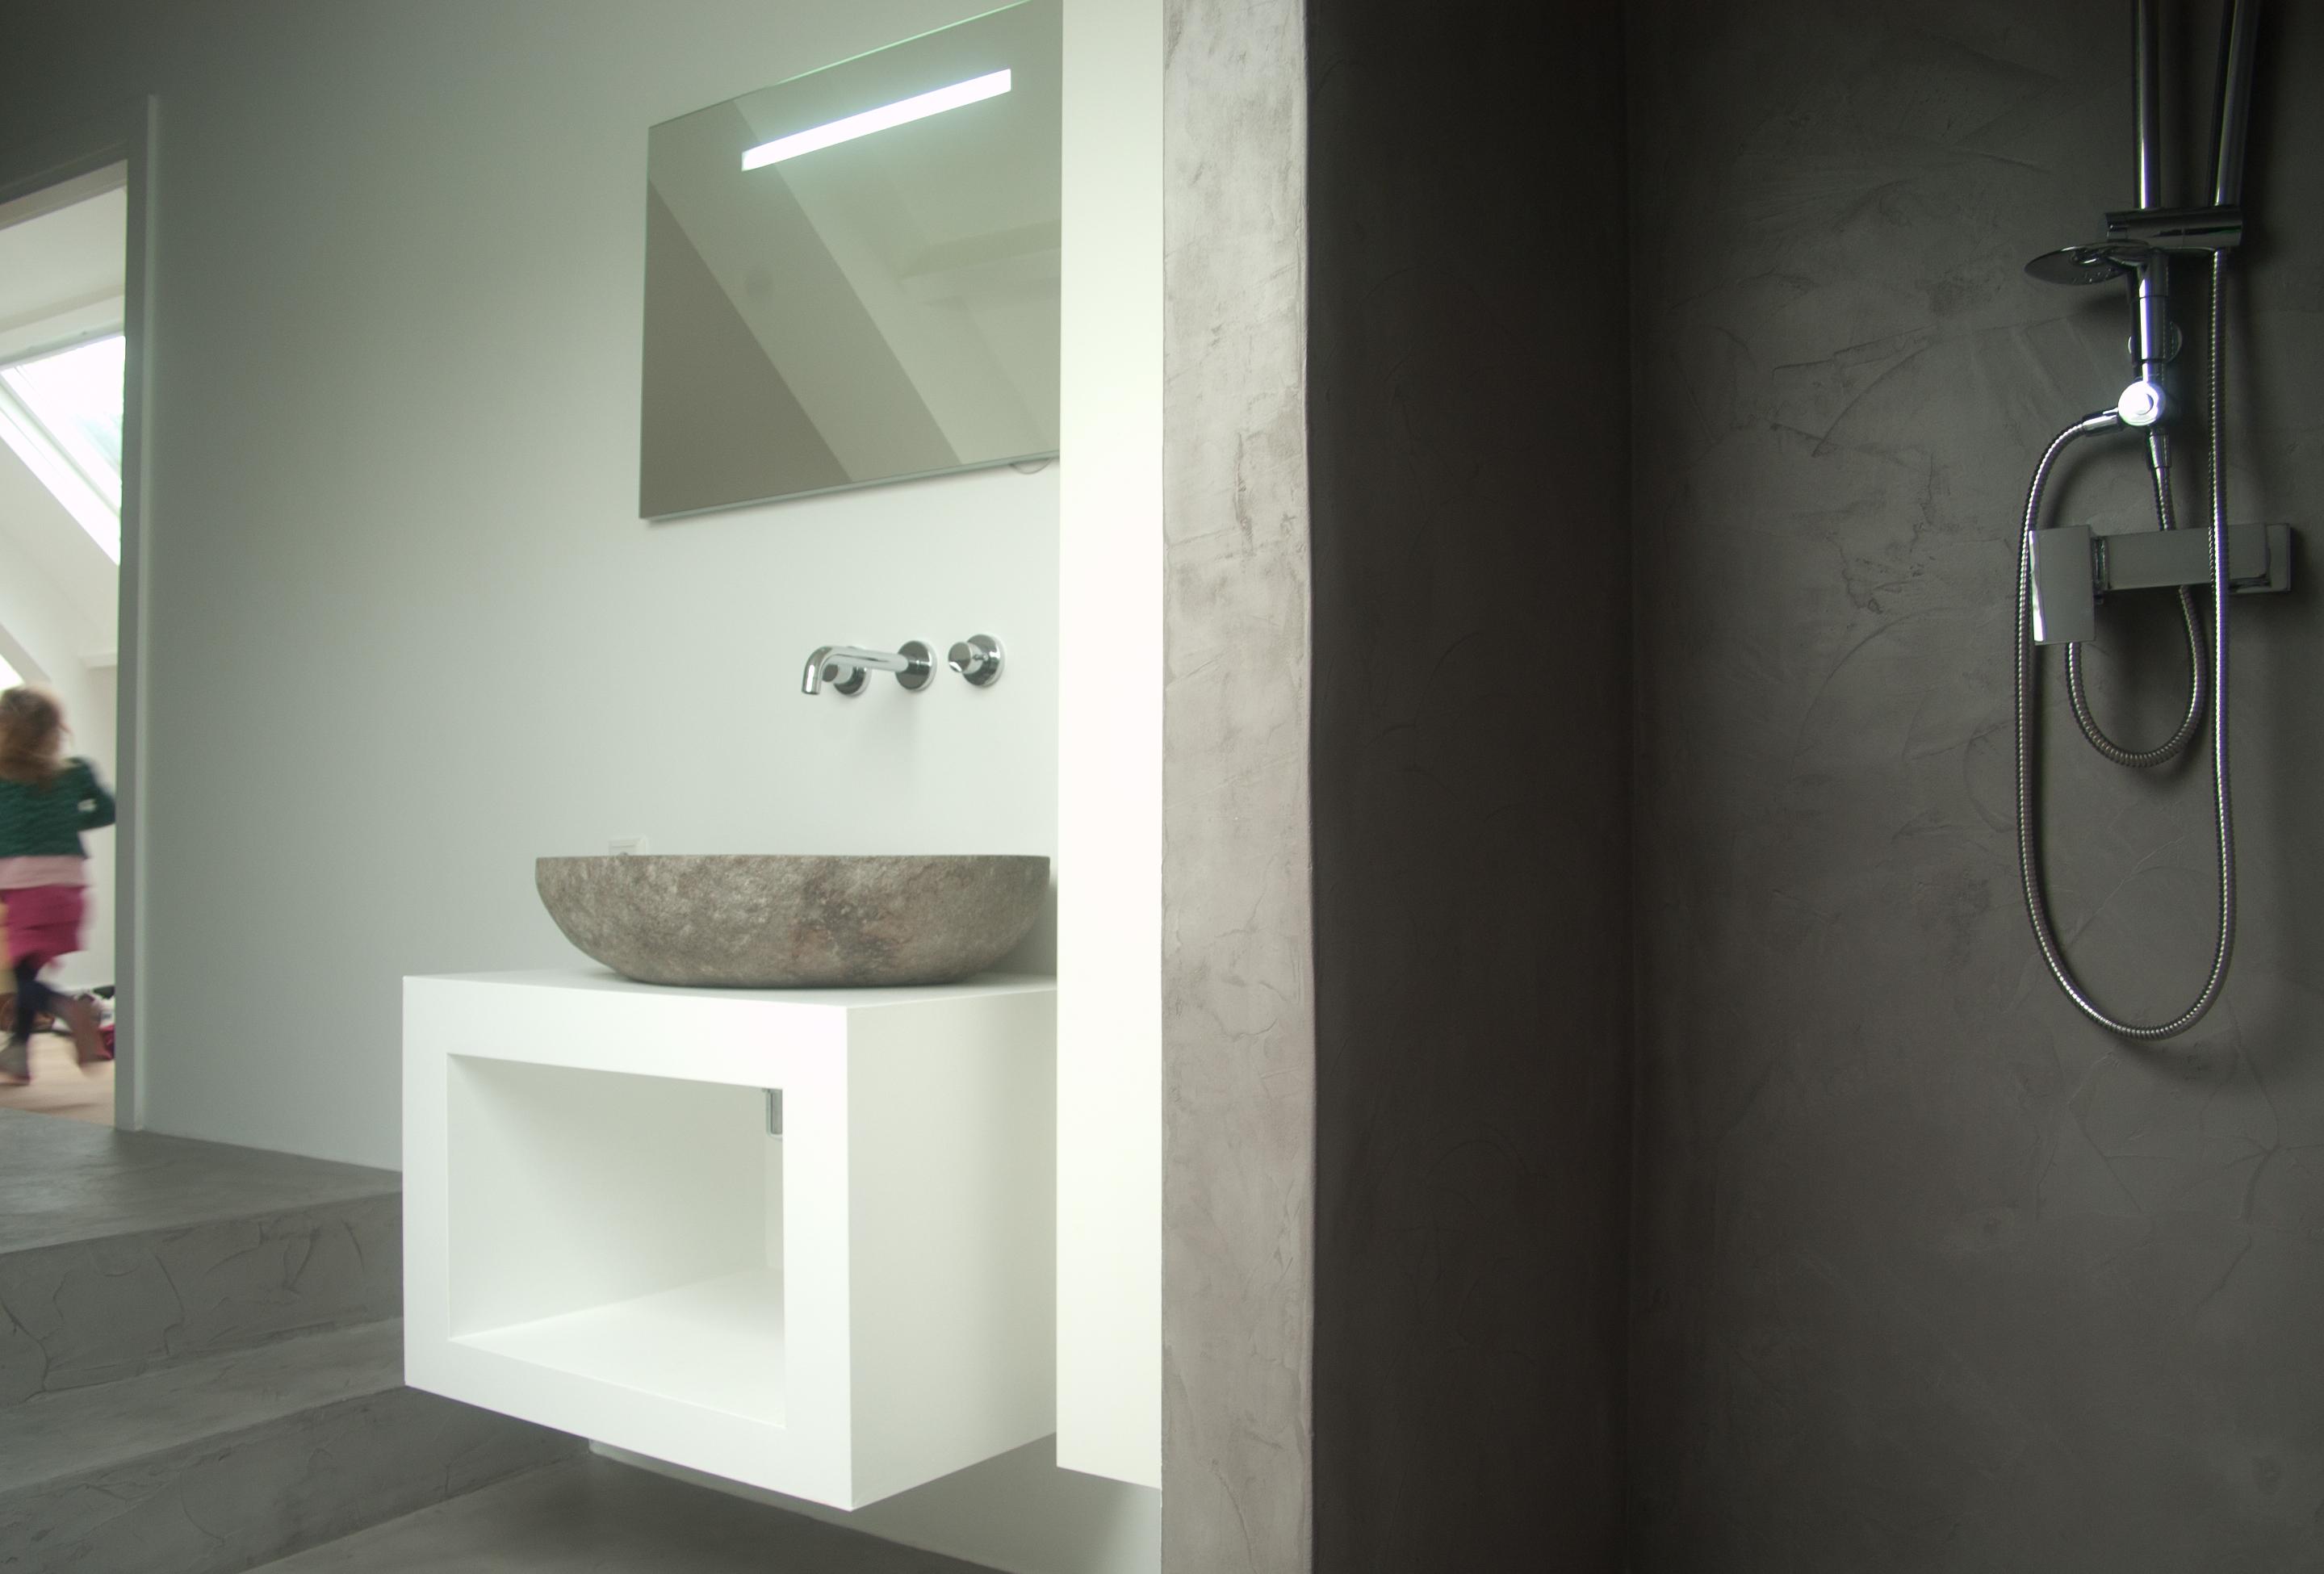 Beton In Badkamer : Badkamermeubels beton badkamer grijs beton